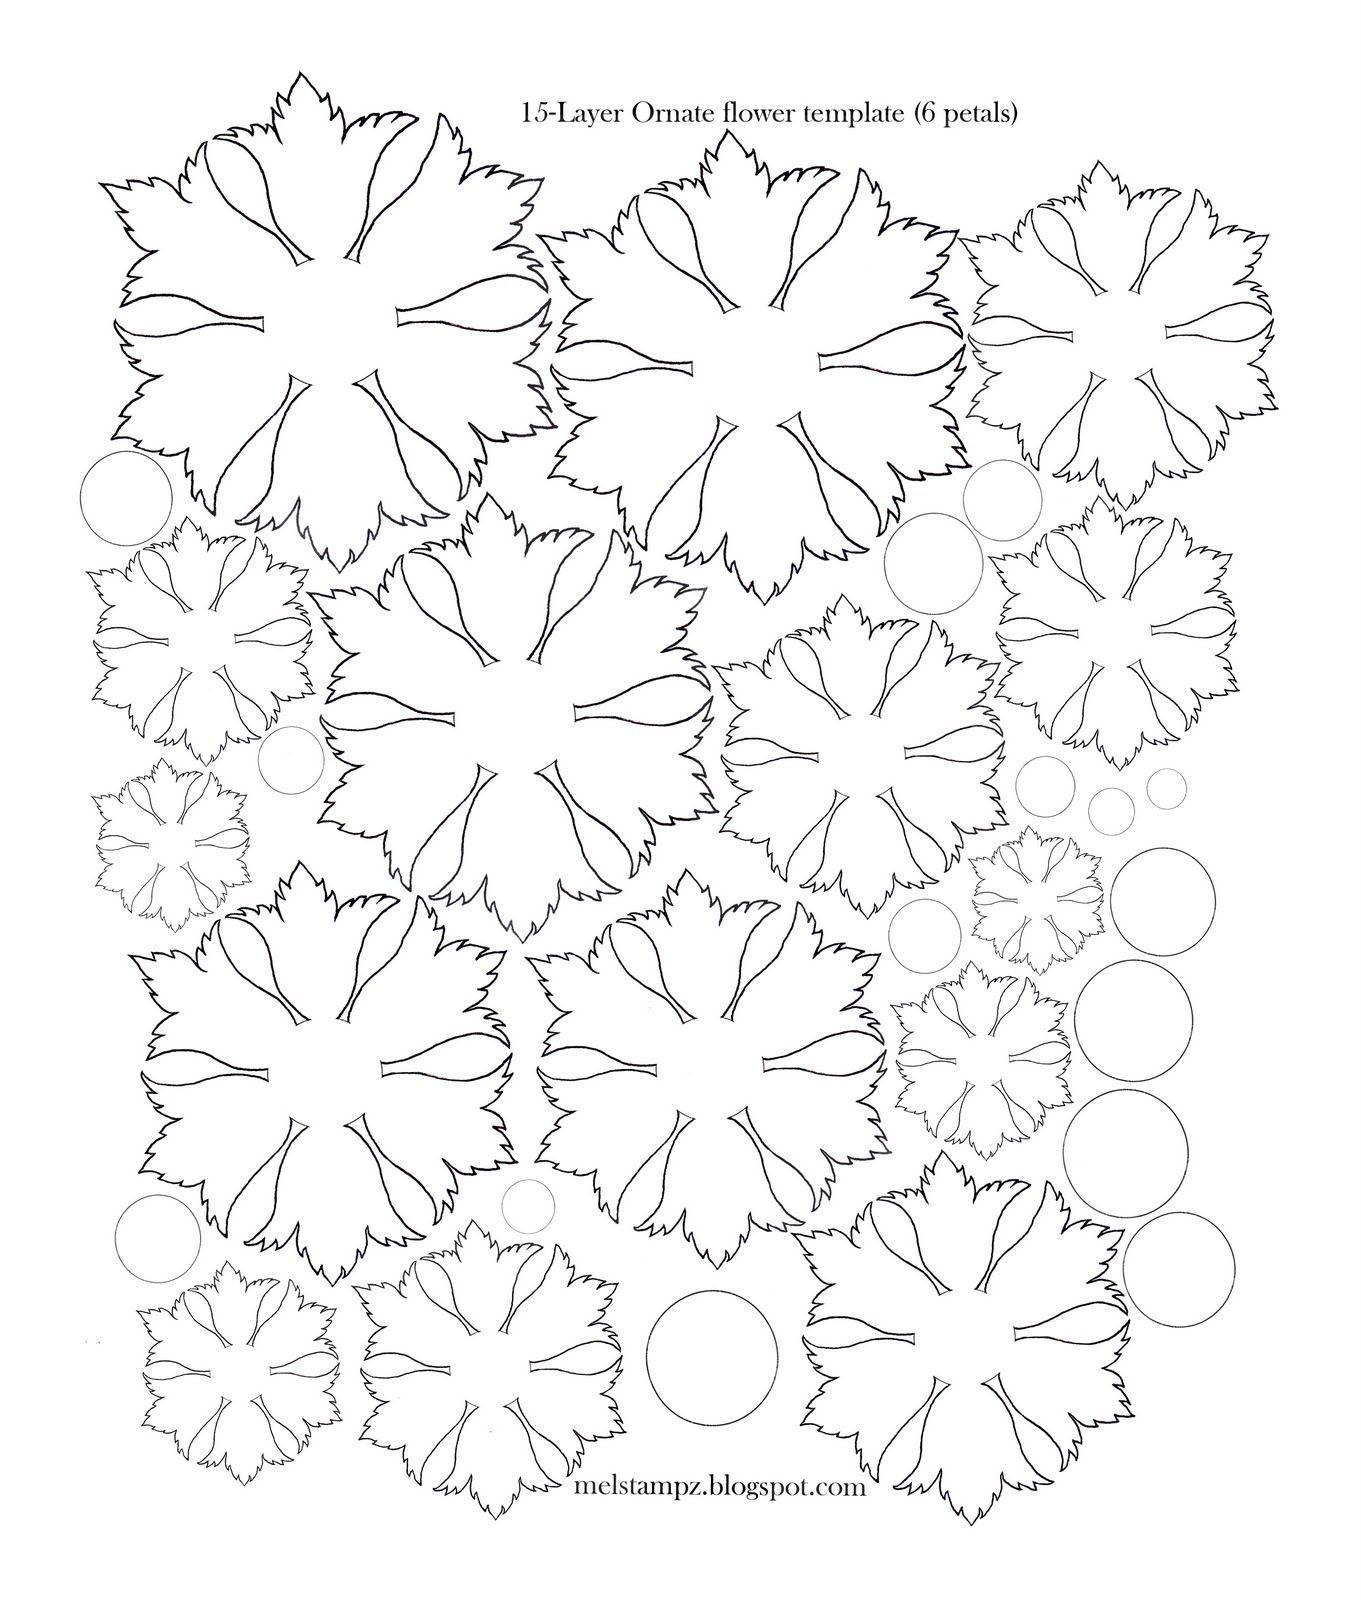 6+petal+ornate+flower+template.jpg 1 361×1 600 pixels